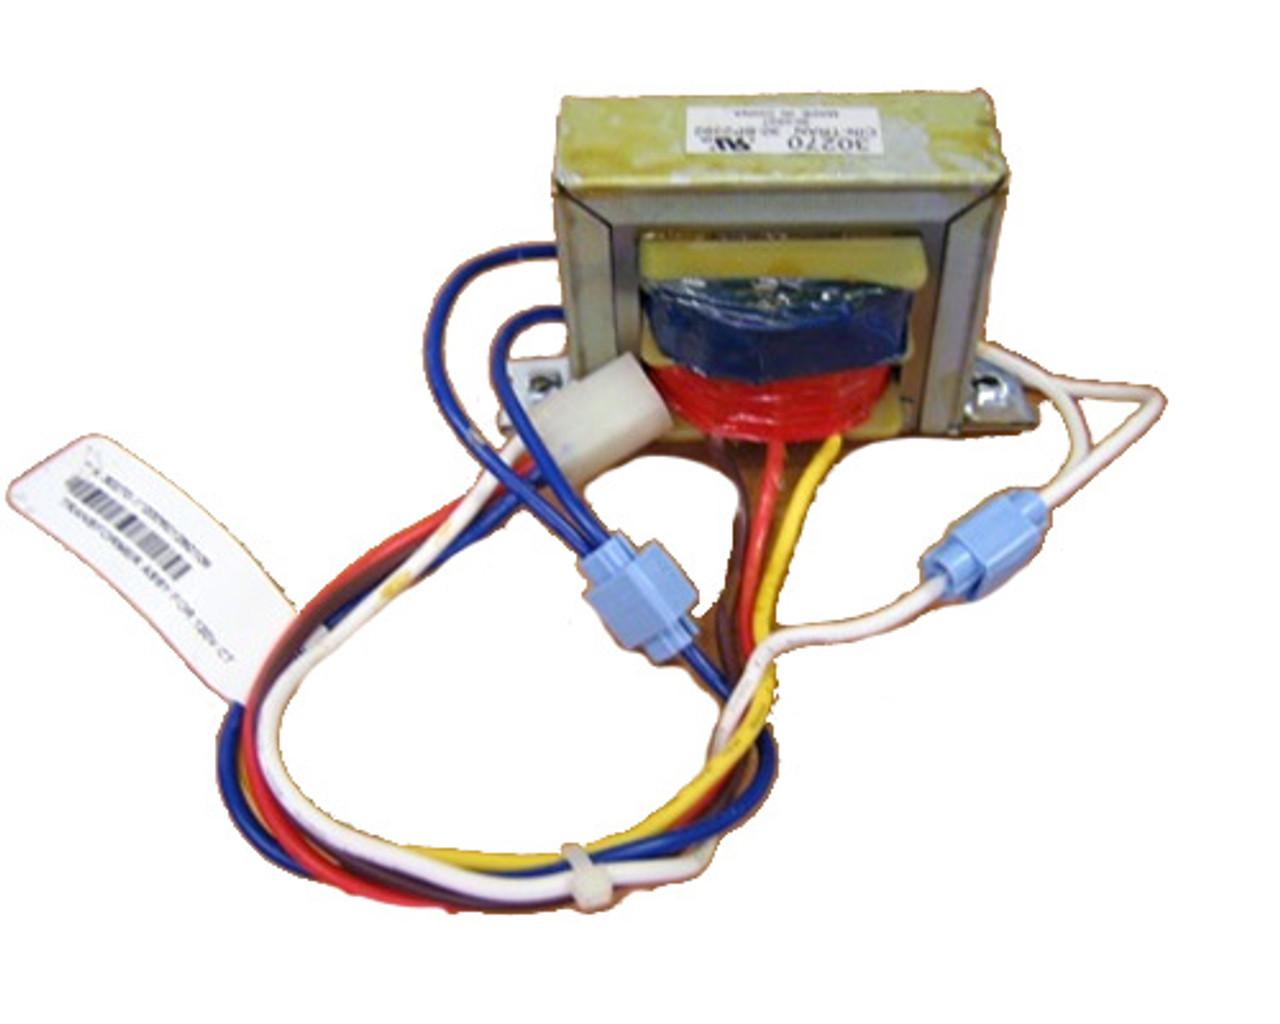 X300005 - 120V Balboa Transformer V/N 30270-1 on